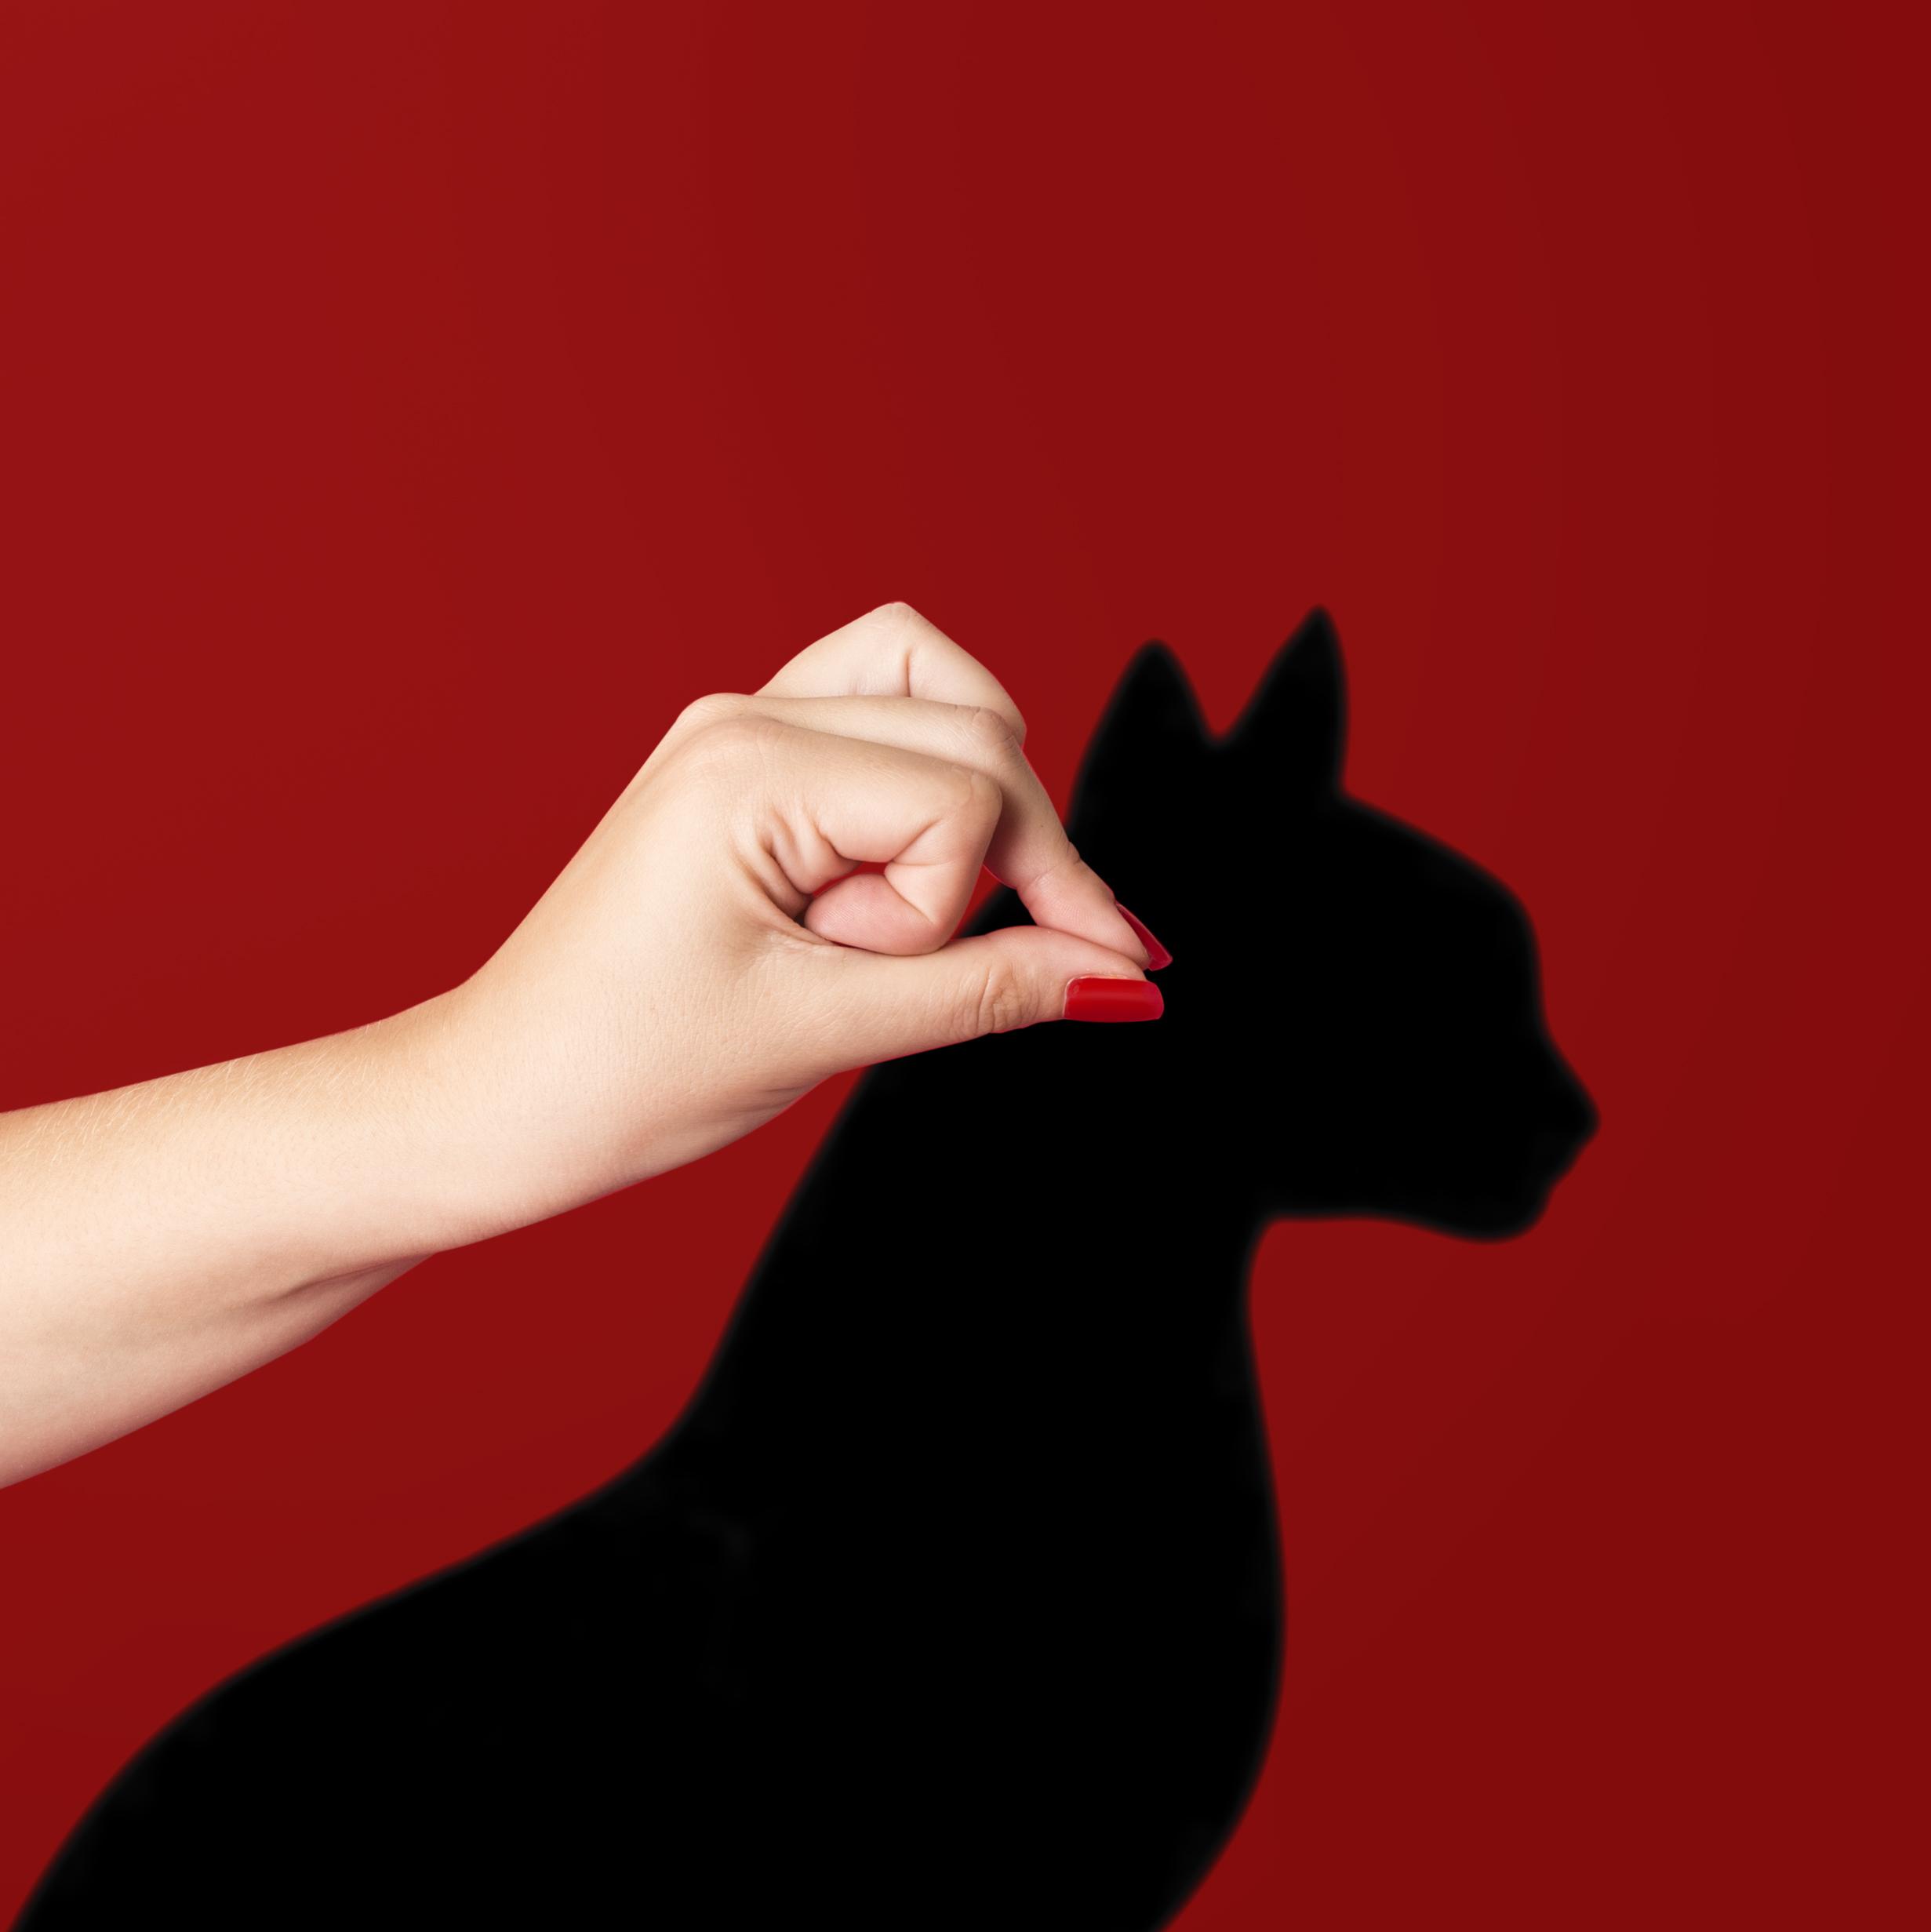 August 17th - Black Cat Appreciation Day